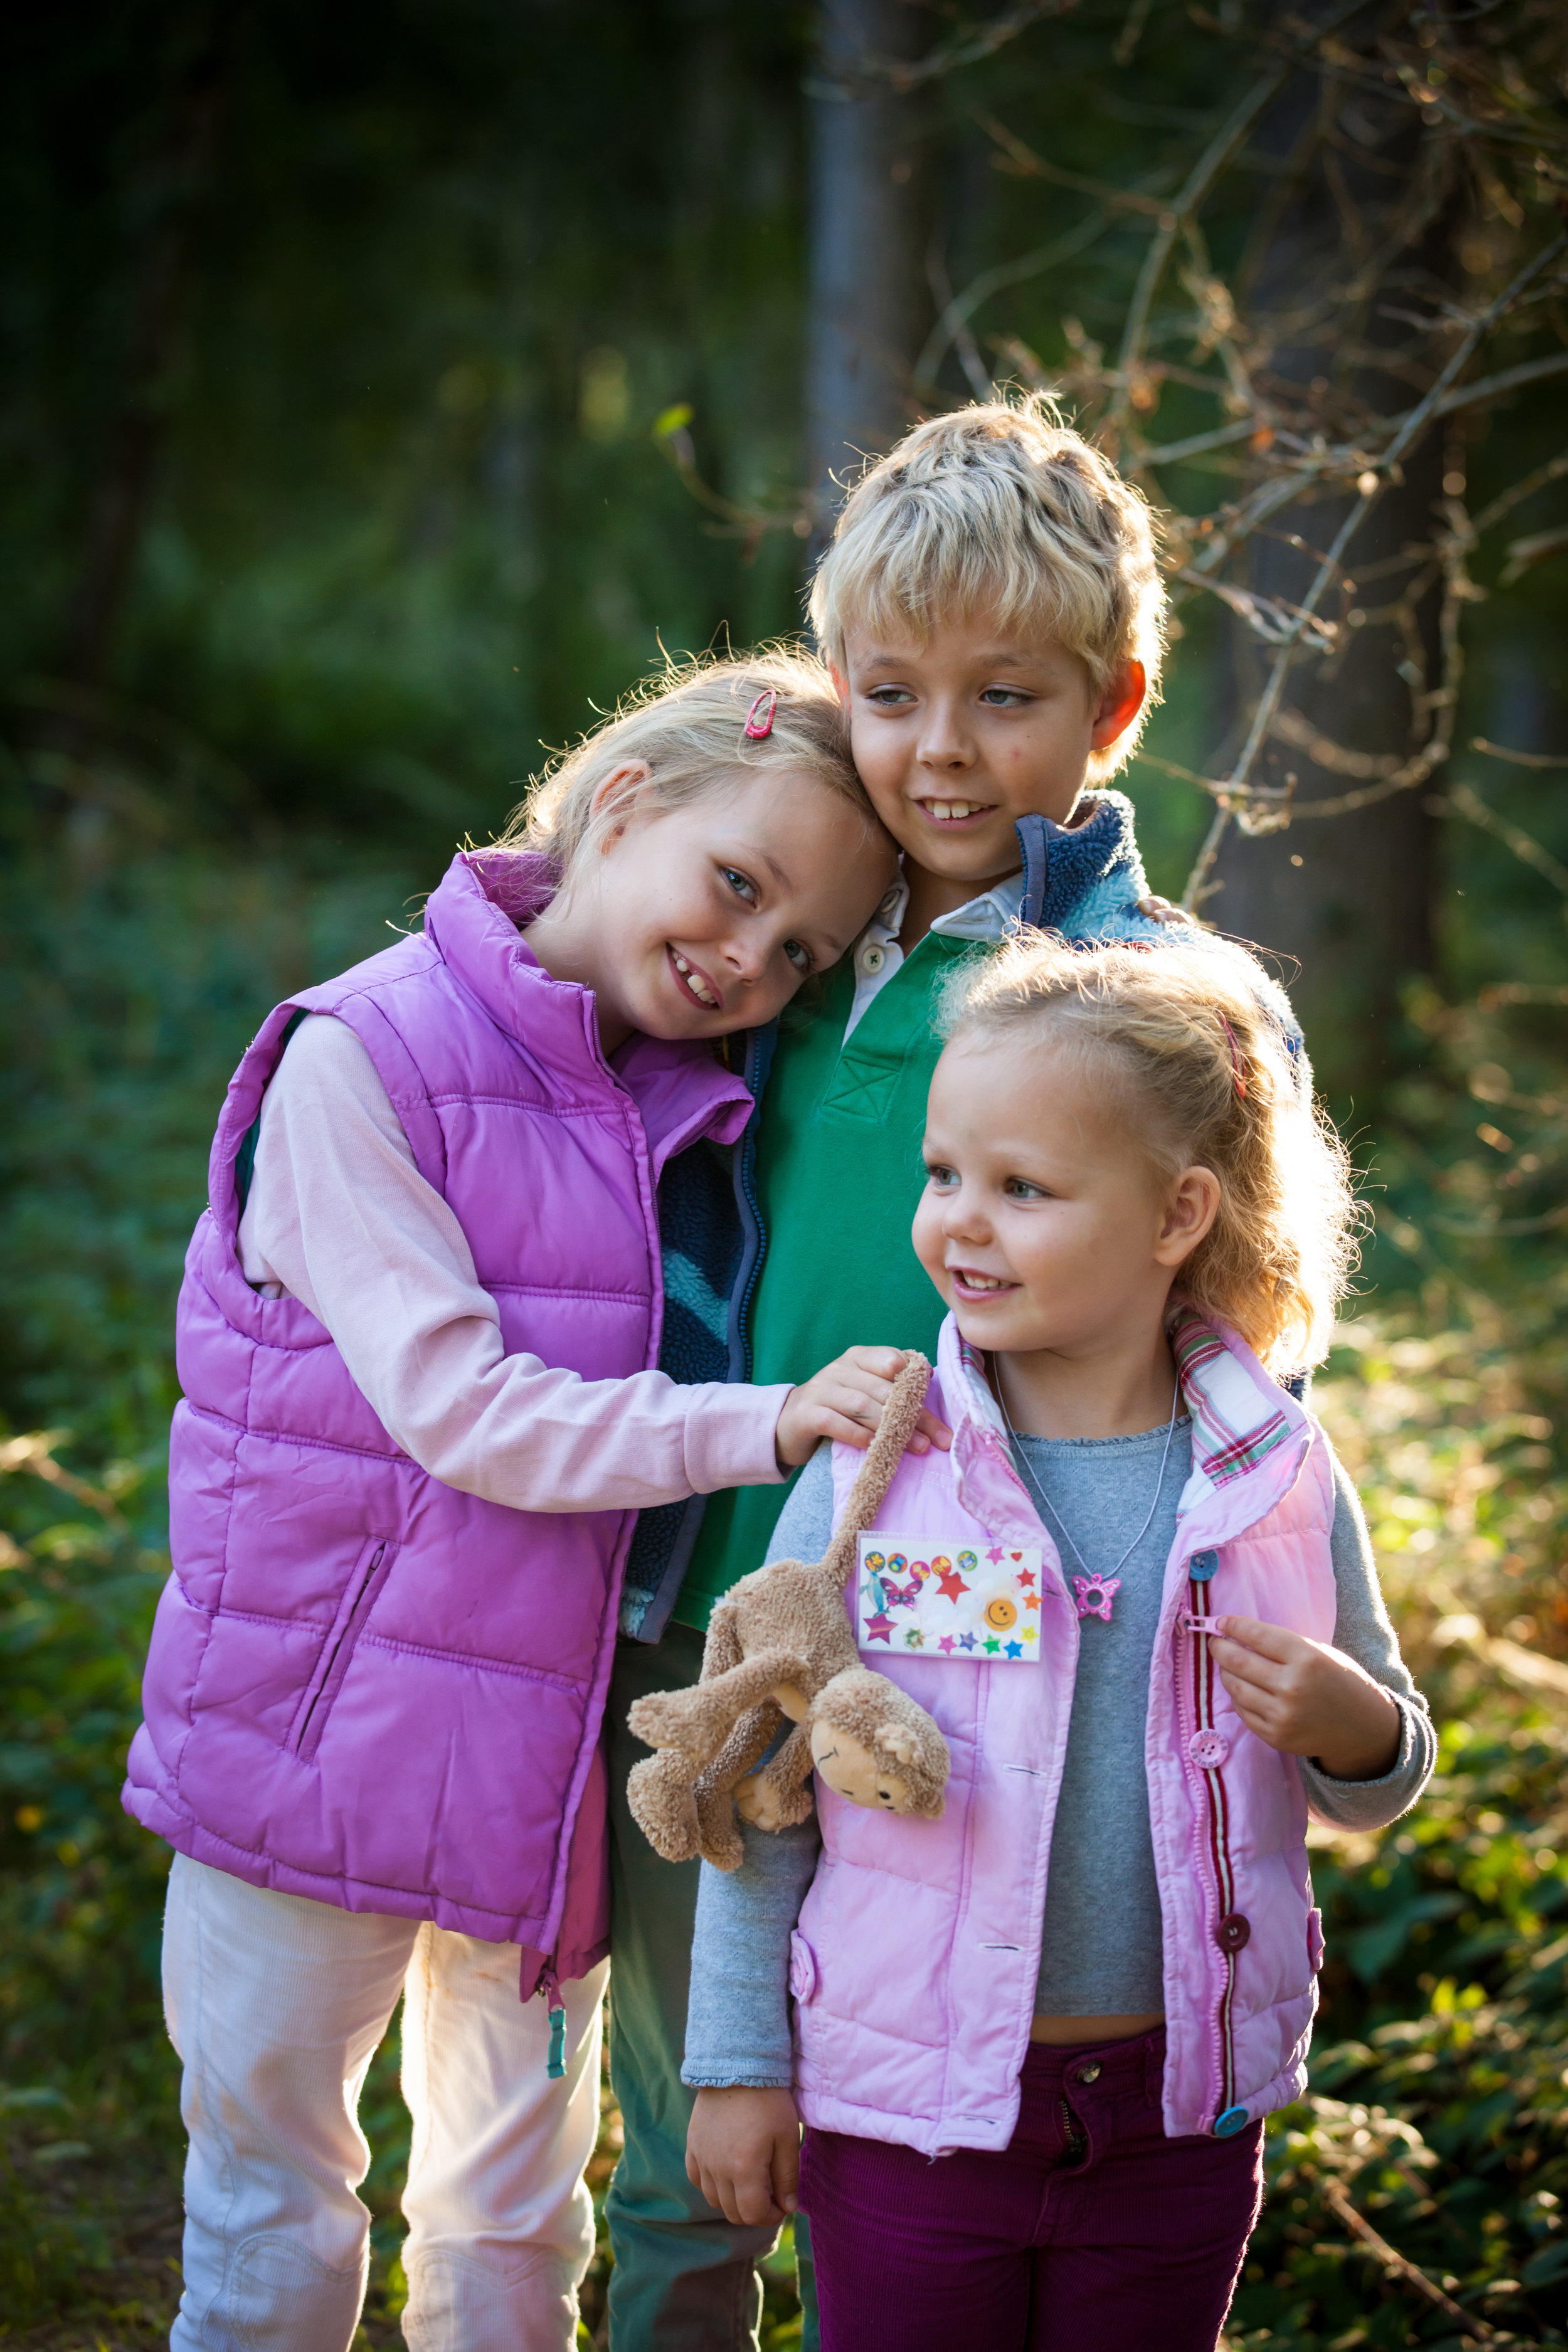 Kids-Portrait-Photography-Buckinghamshire026.jpg